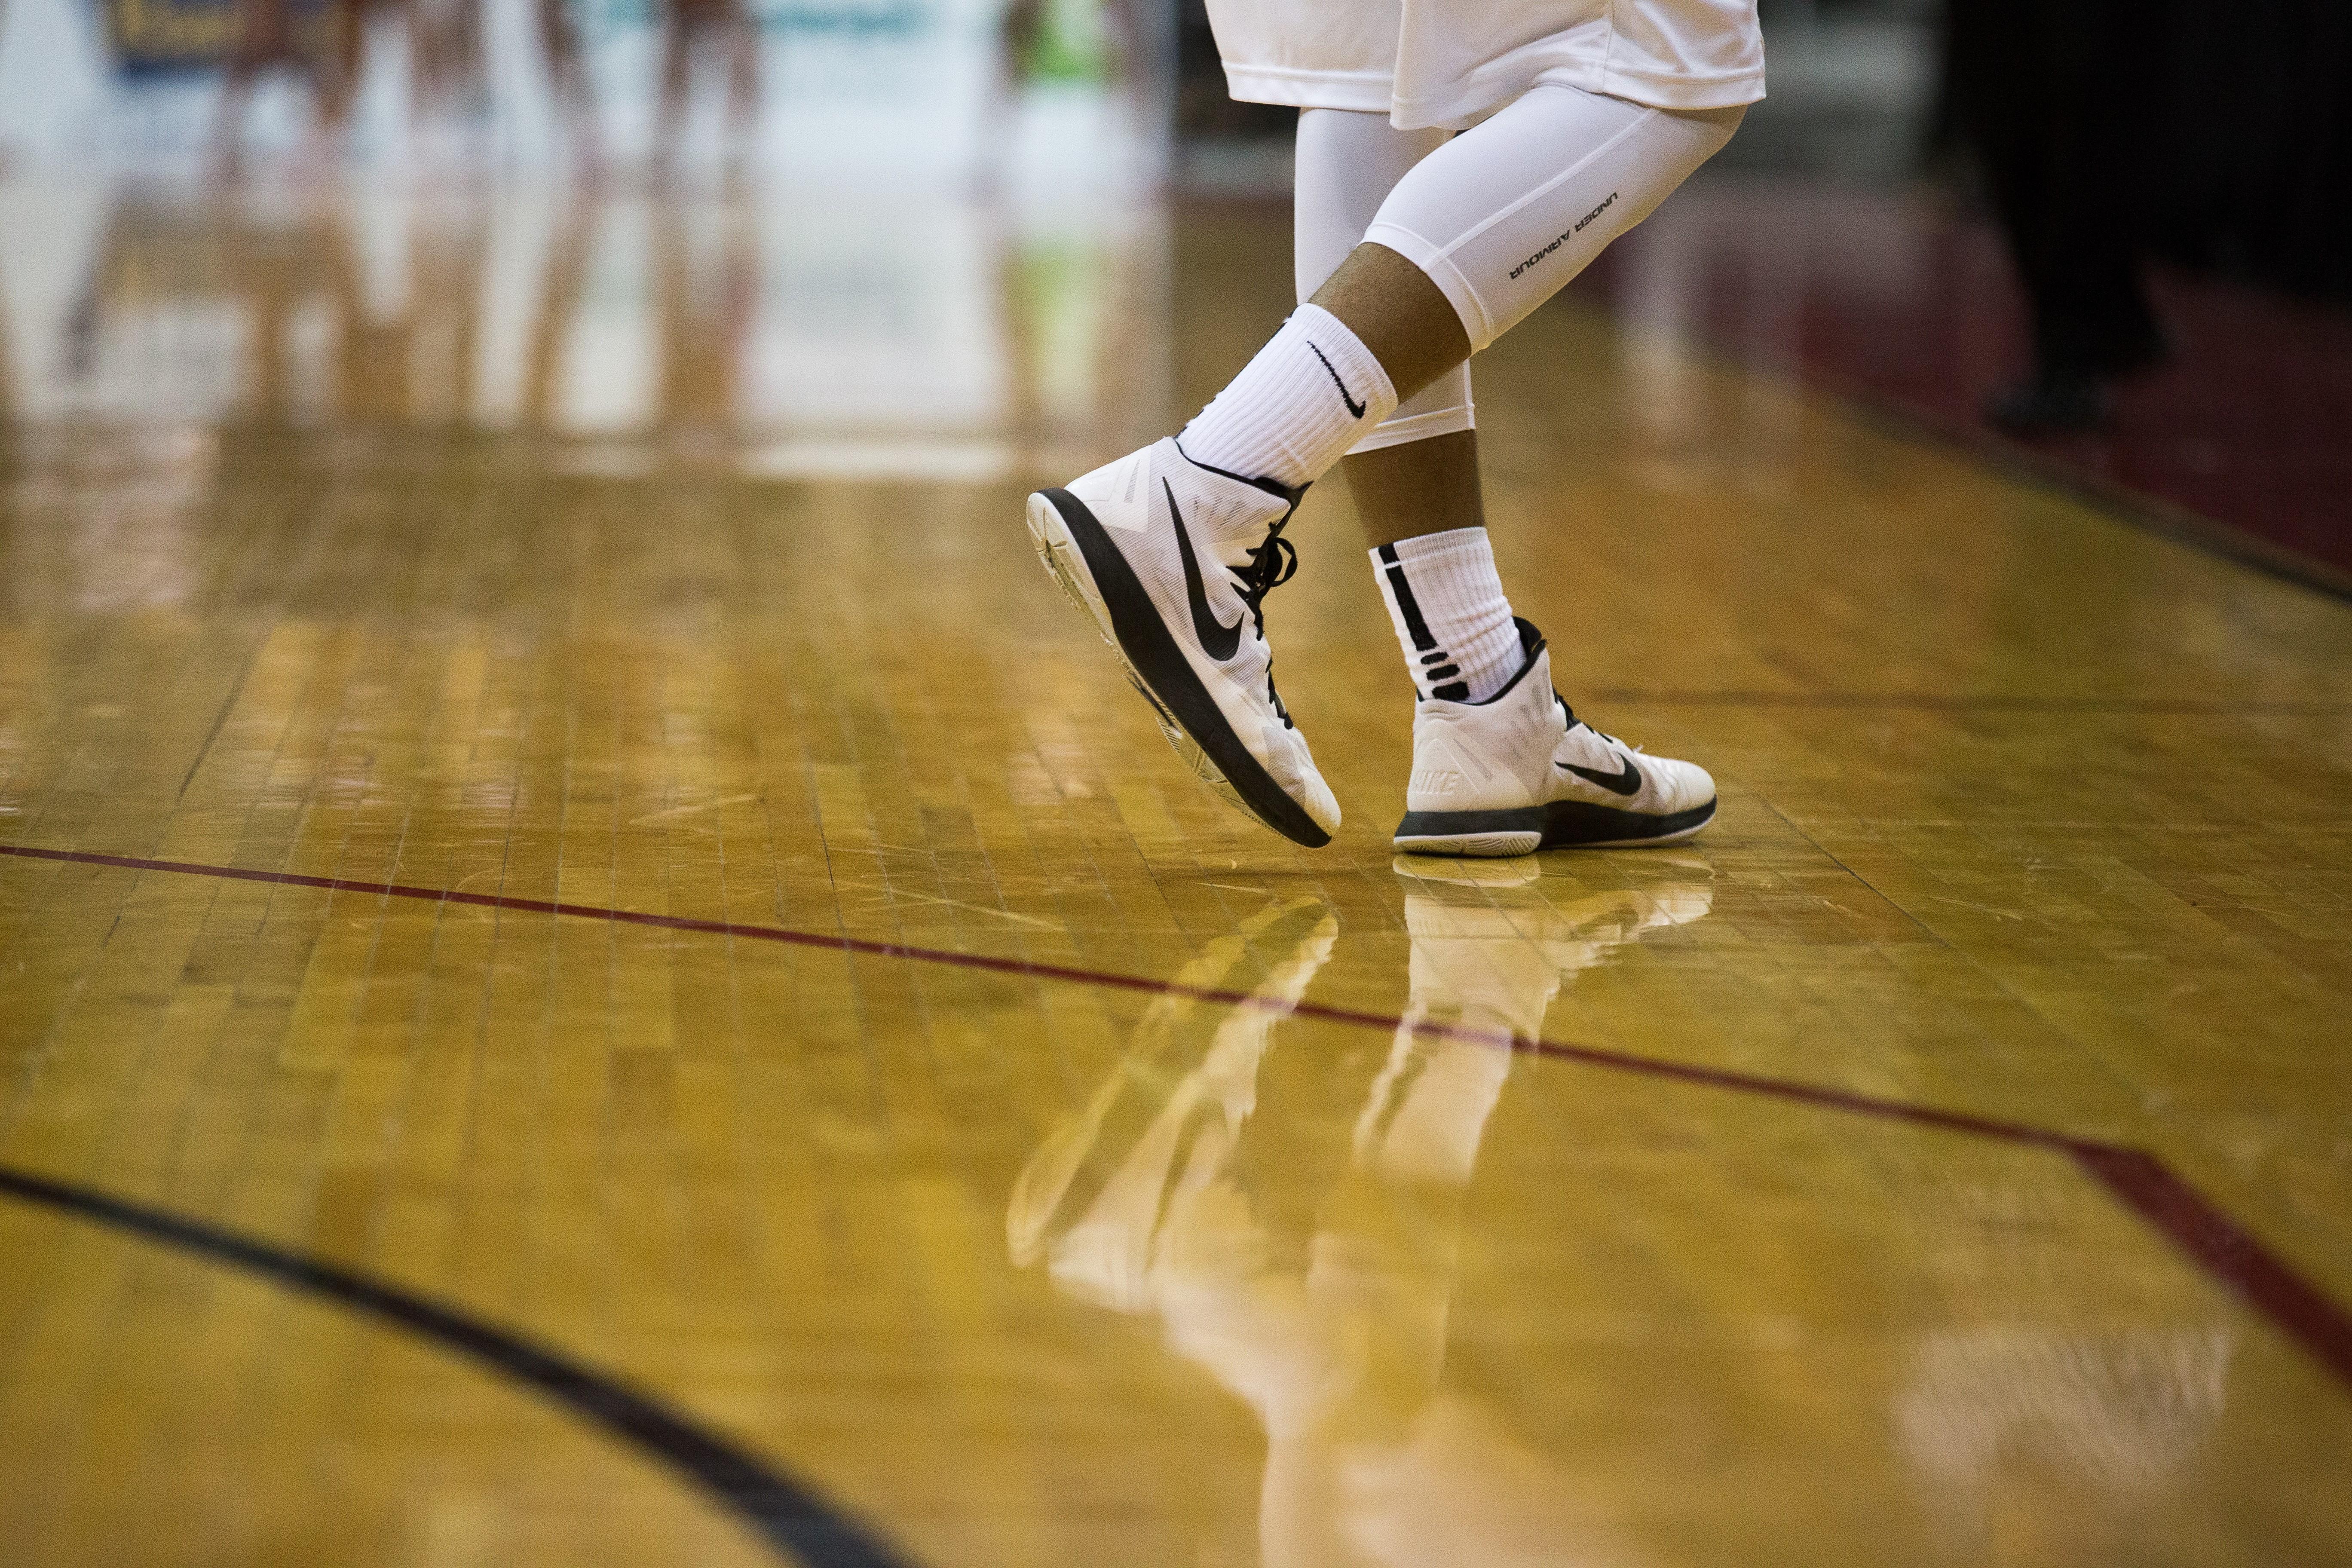 A man wearing high-quality black & white Nike sneakers